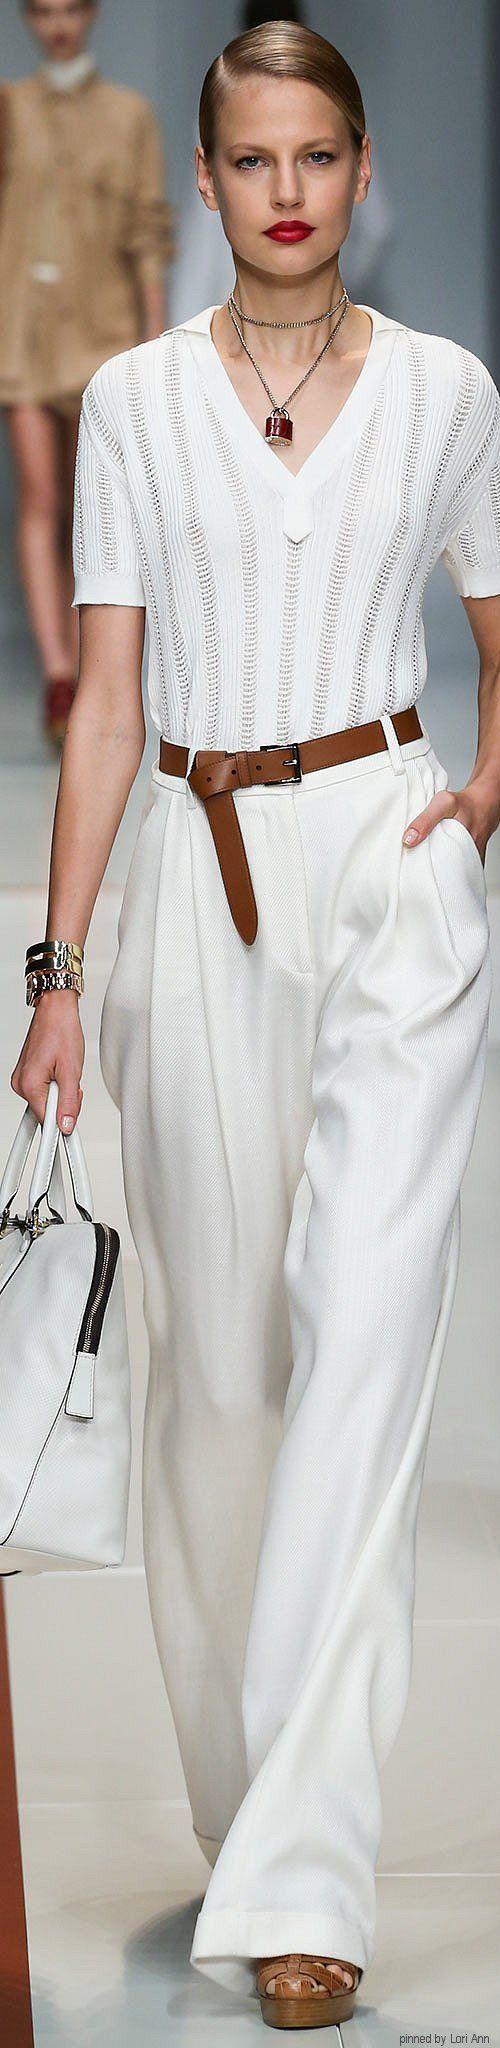 Trussardi Spring 2015 RTW  women fashion outfit clothing stylish apparel @roressclothes closet ideas